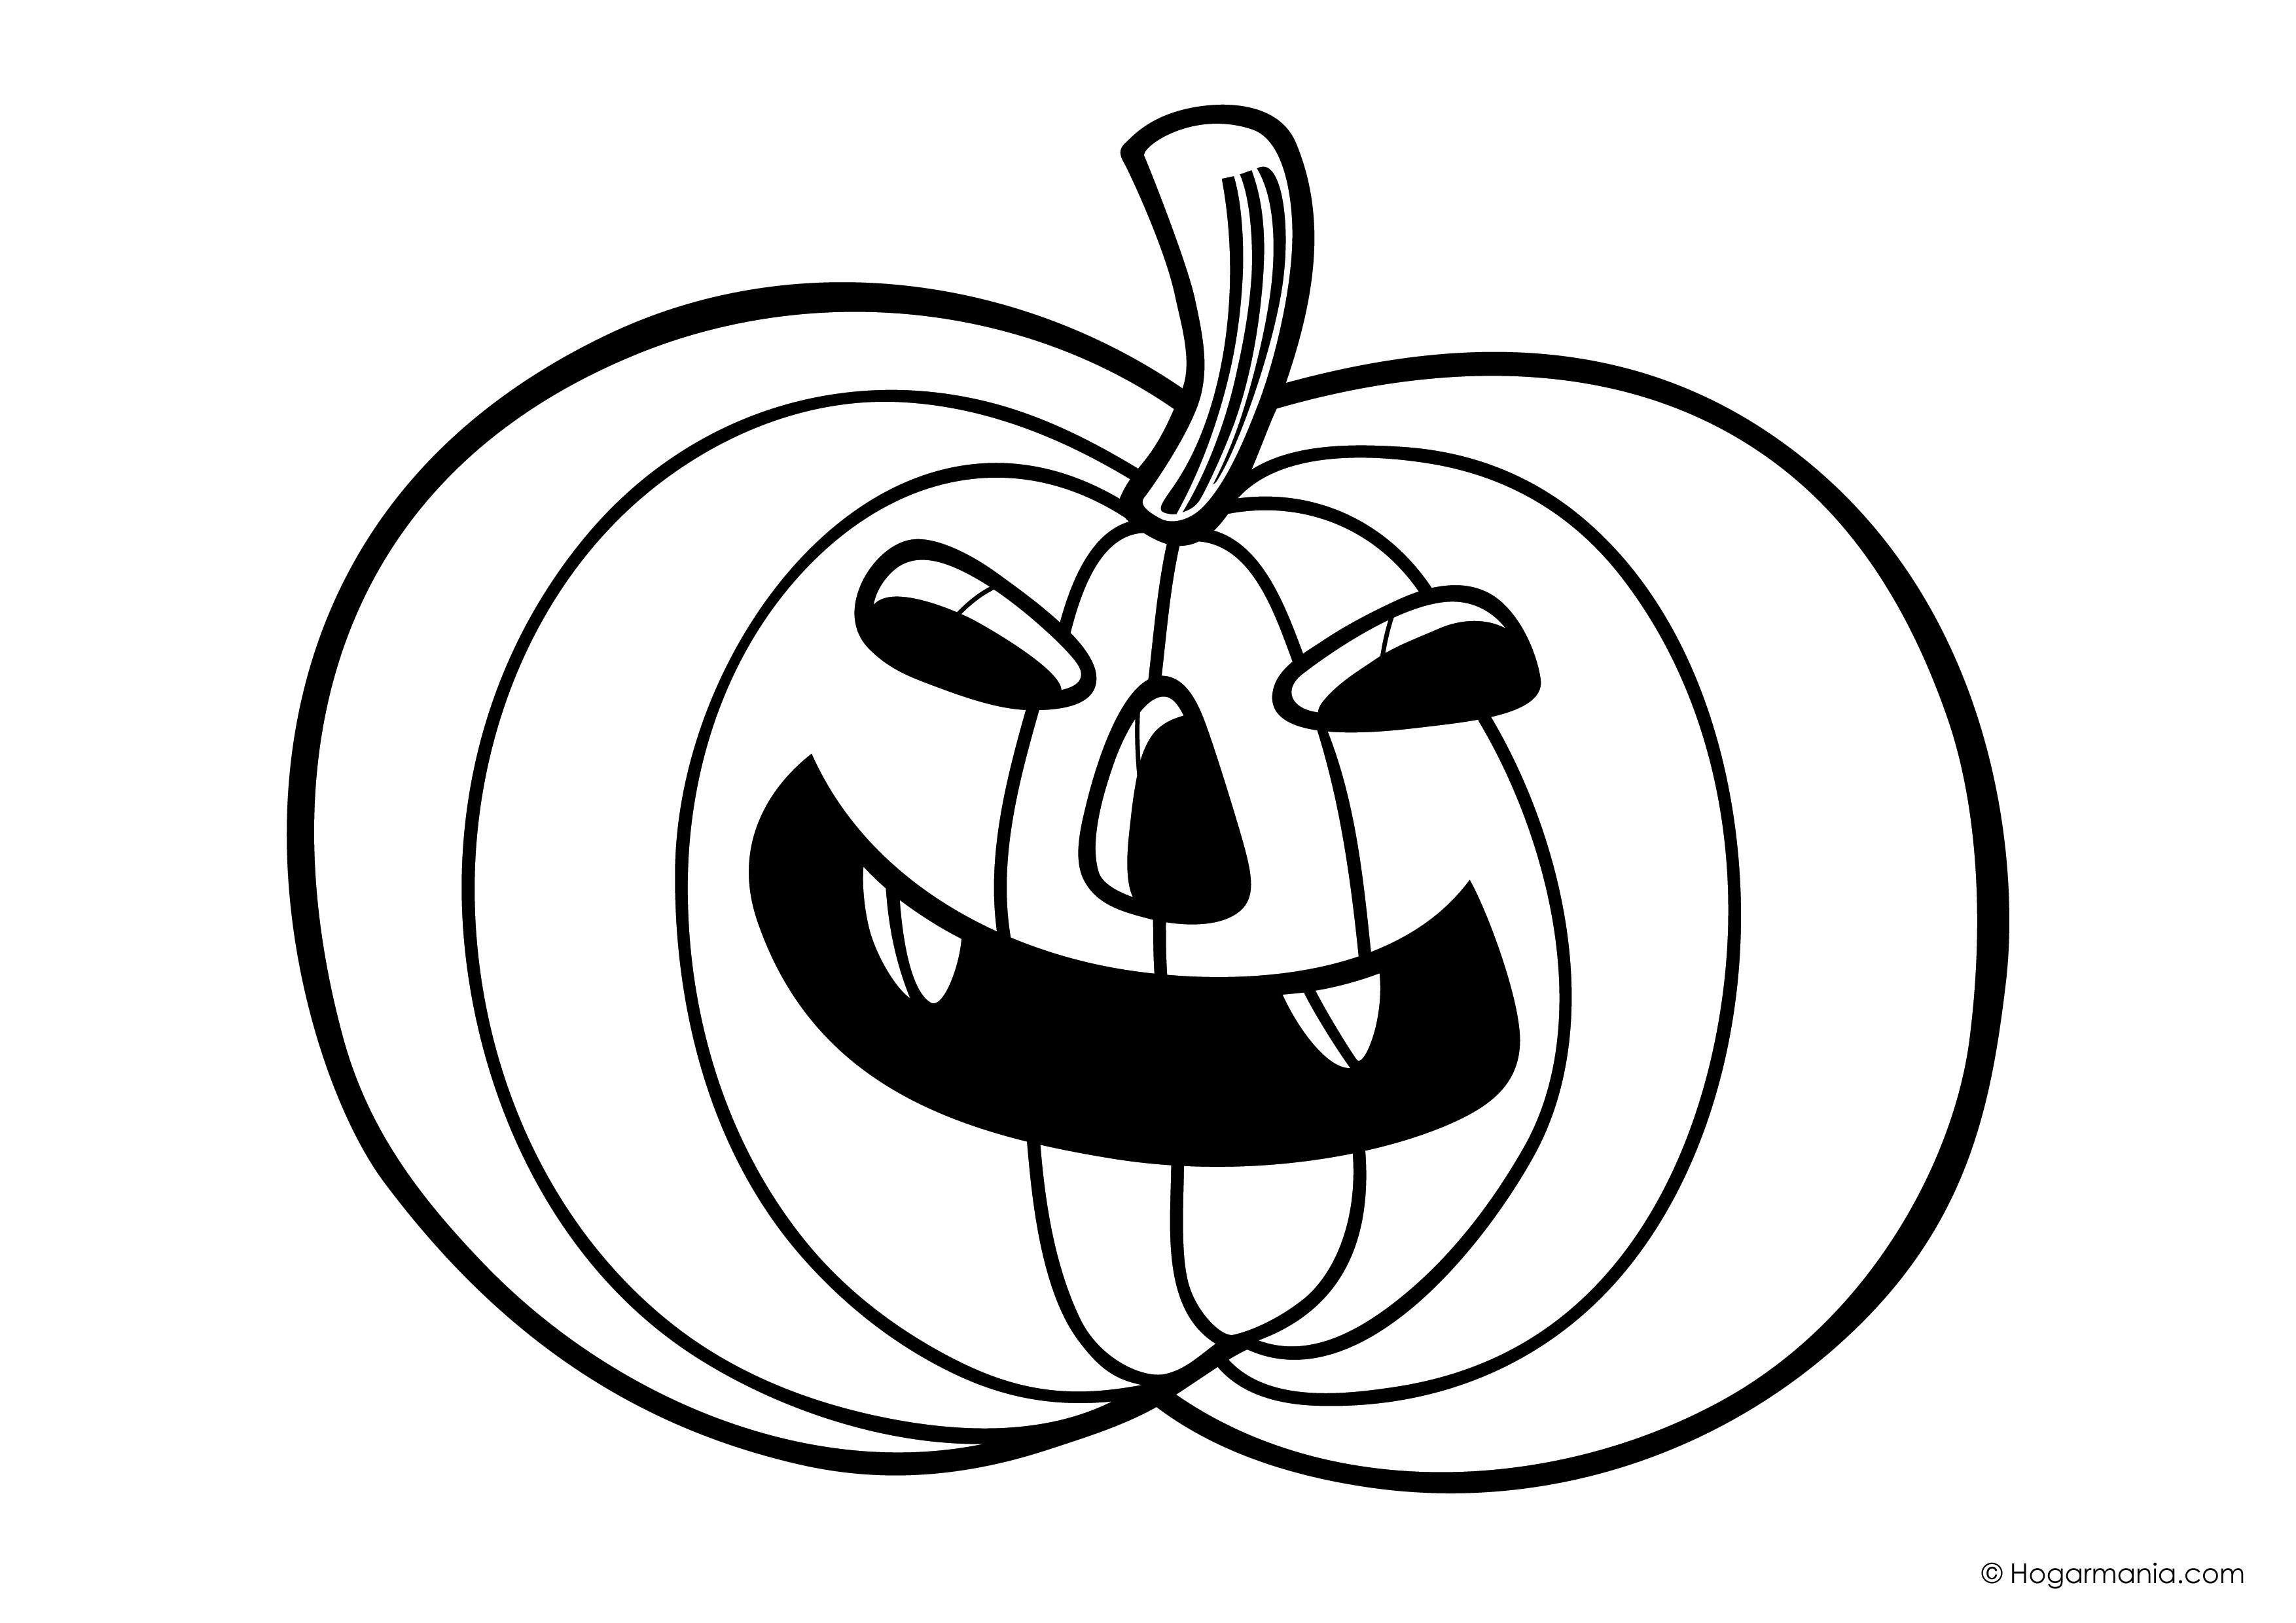 Calabazas halloween para imprimir careta latest dibujos de calabaza para pintar trendy dibujo - Calabazas para imprimir ...